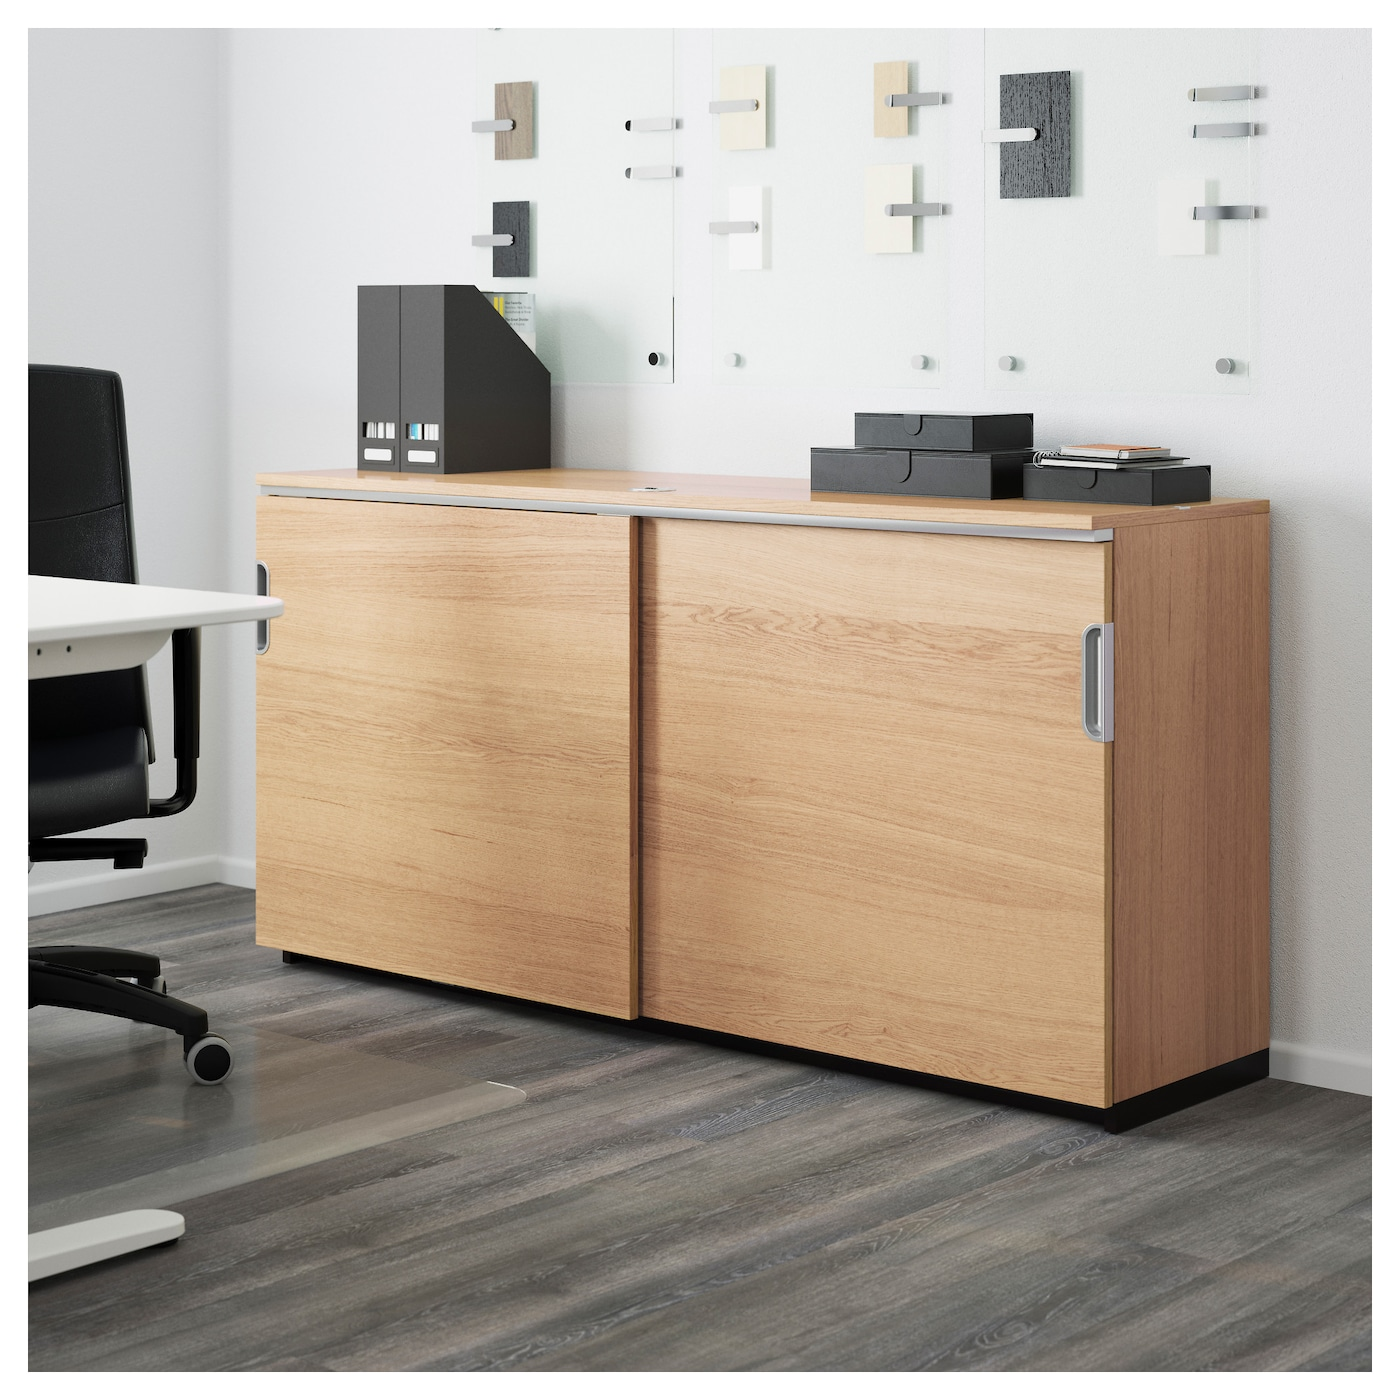 Galant Cabinet With Sliding Doors Oak Veneer 160x80 Cm Ikea